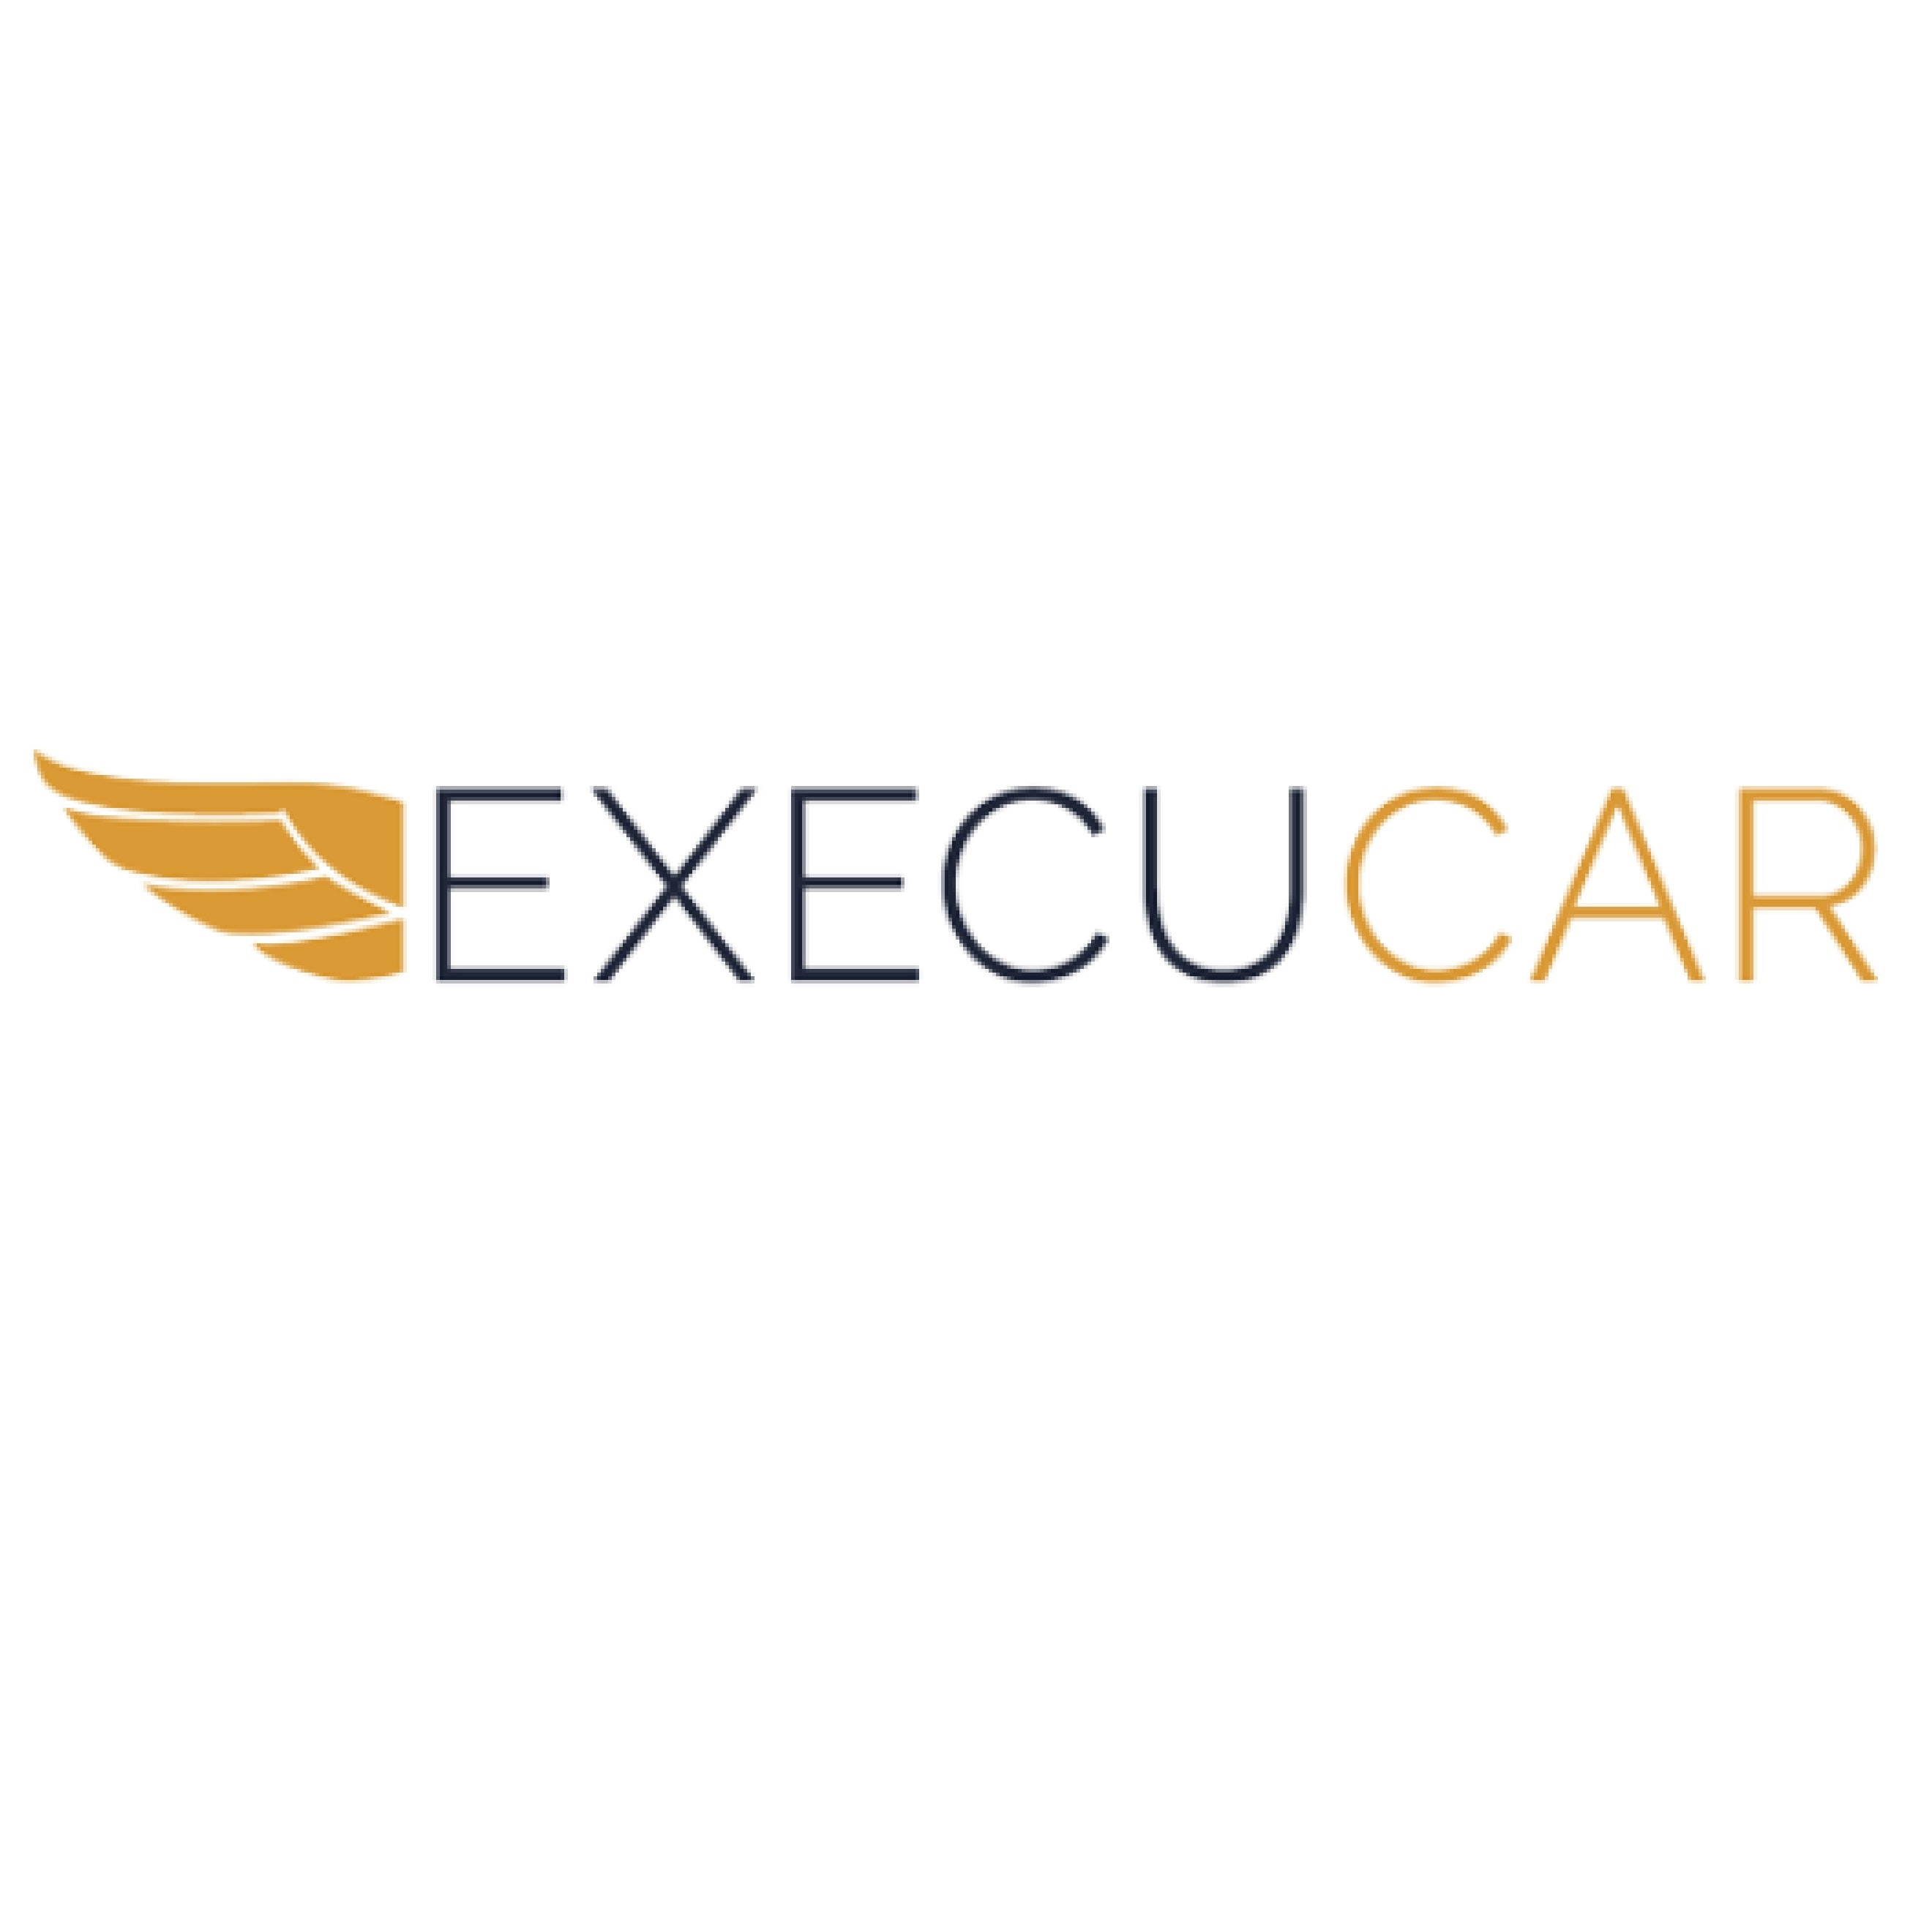 Execucar - Premium Sedan, Curbside